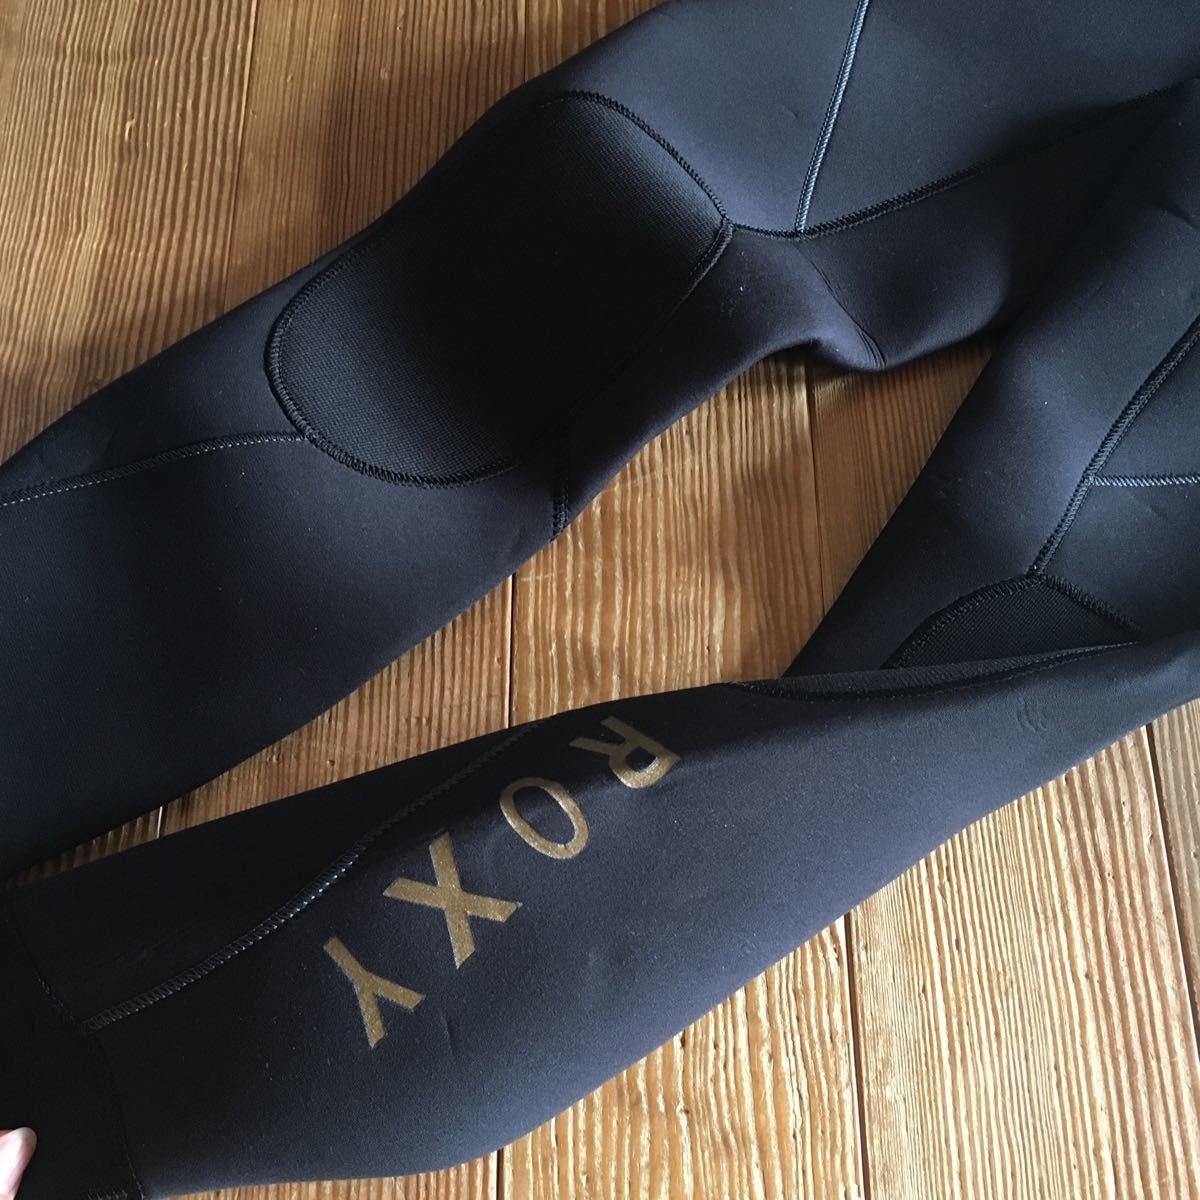 ROXY ロキシー ウェットスーツ フルスーツ 5/3mm ML 新品 未使用 定価66000円(税抜)_画像8